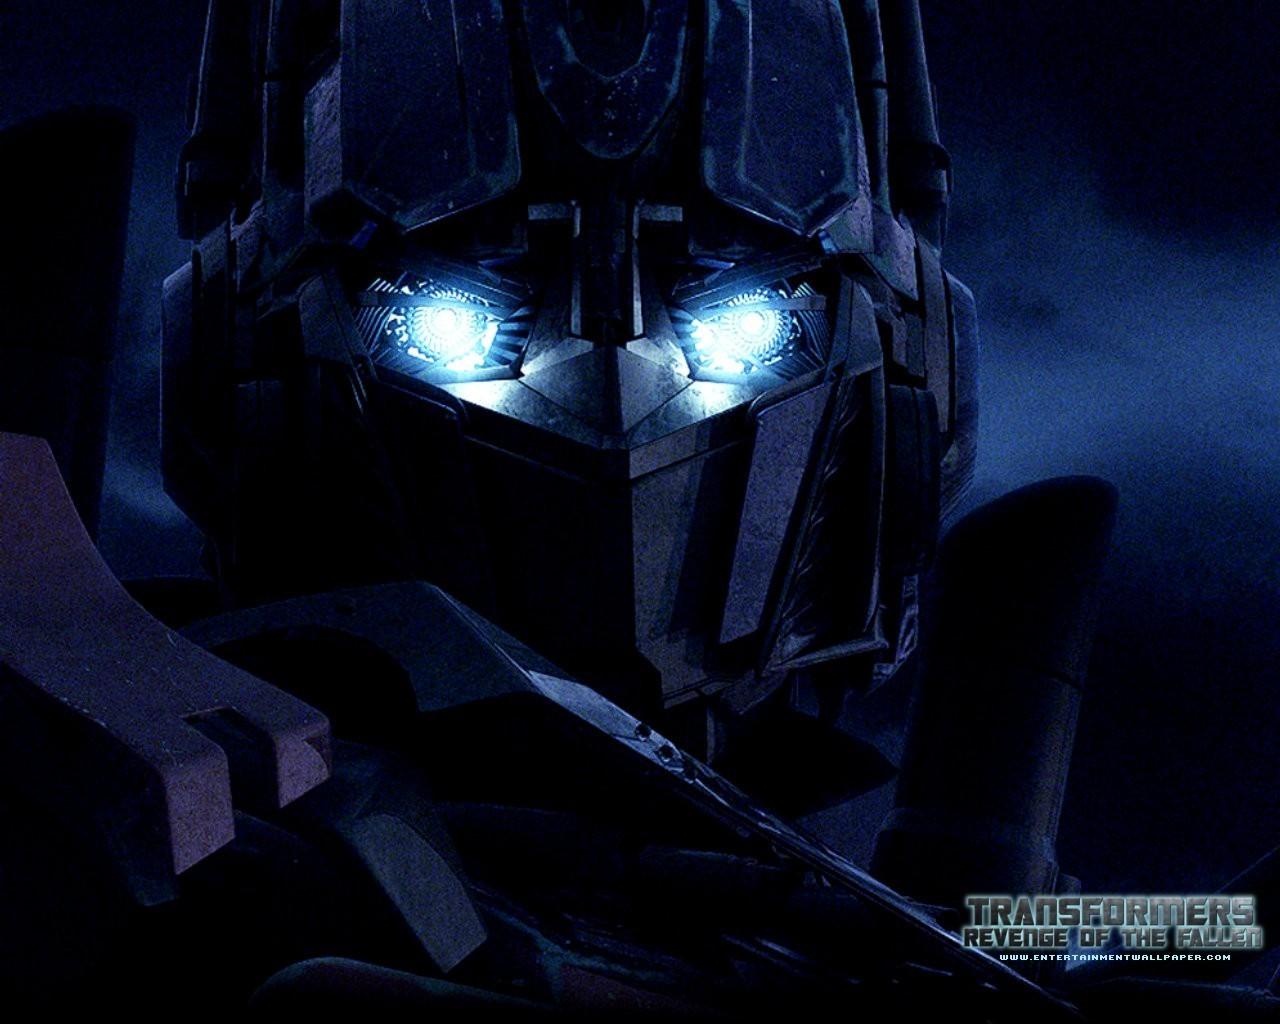 Transformers :Revenge of the Fallen - Transformers ...